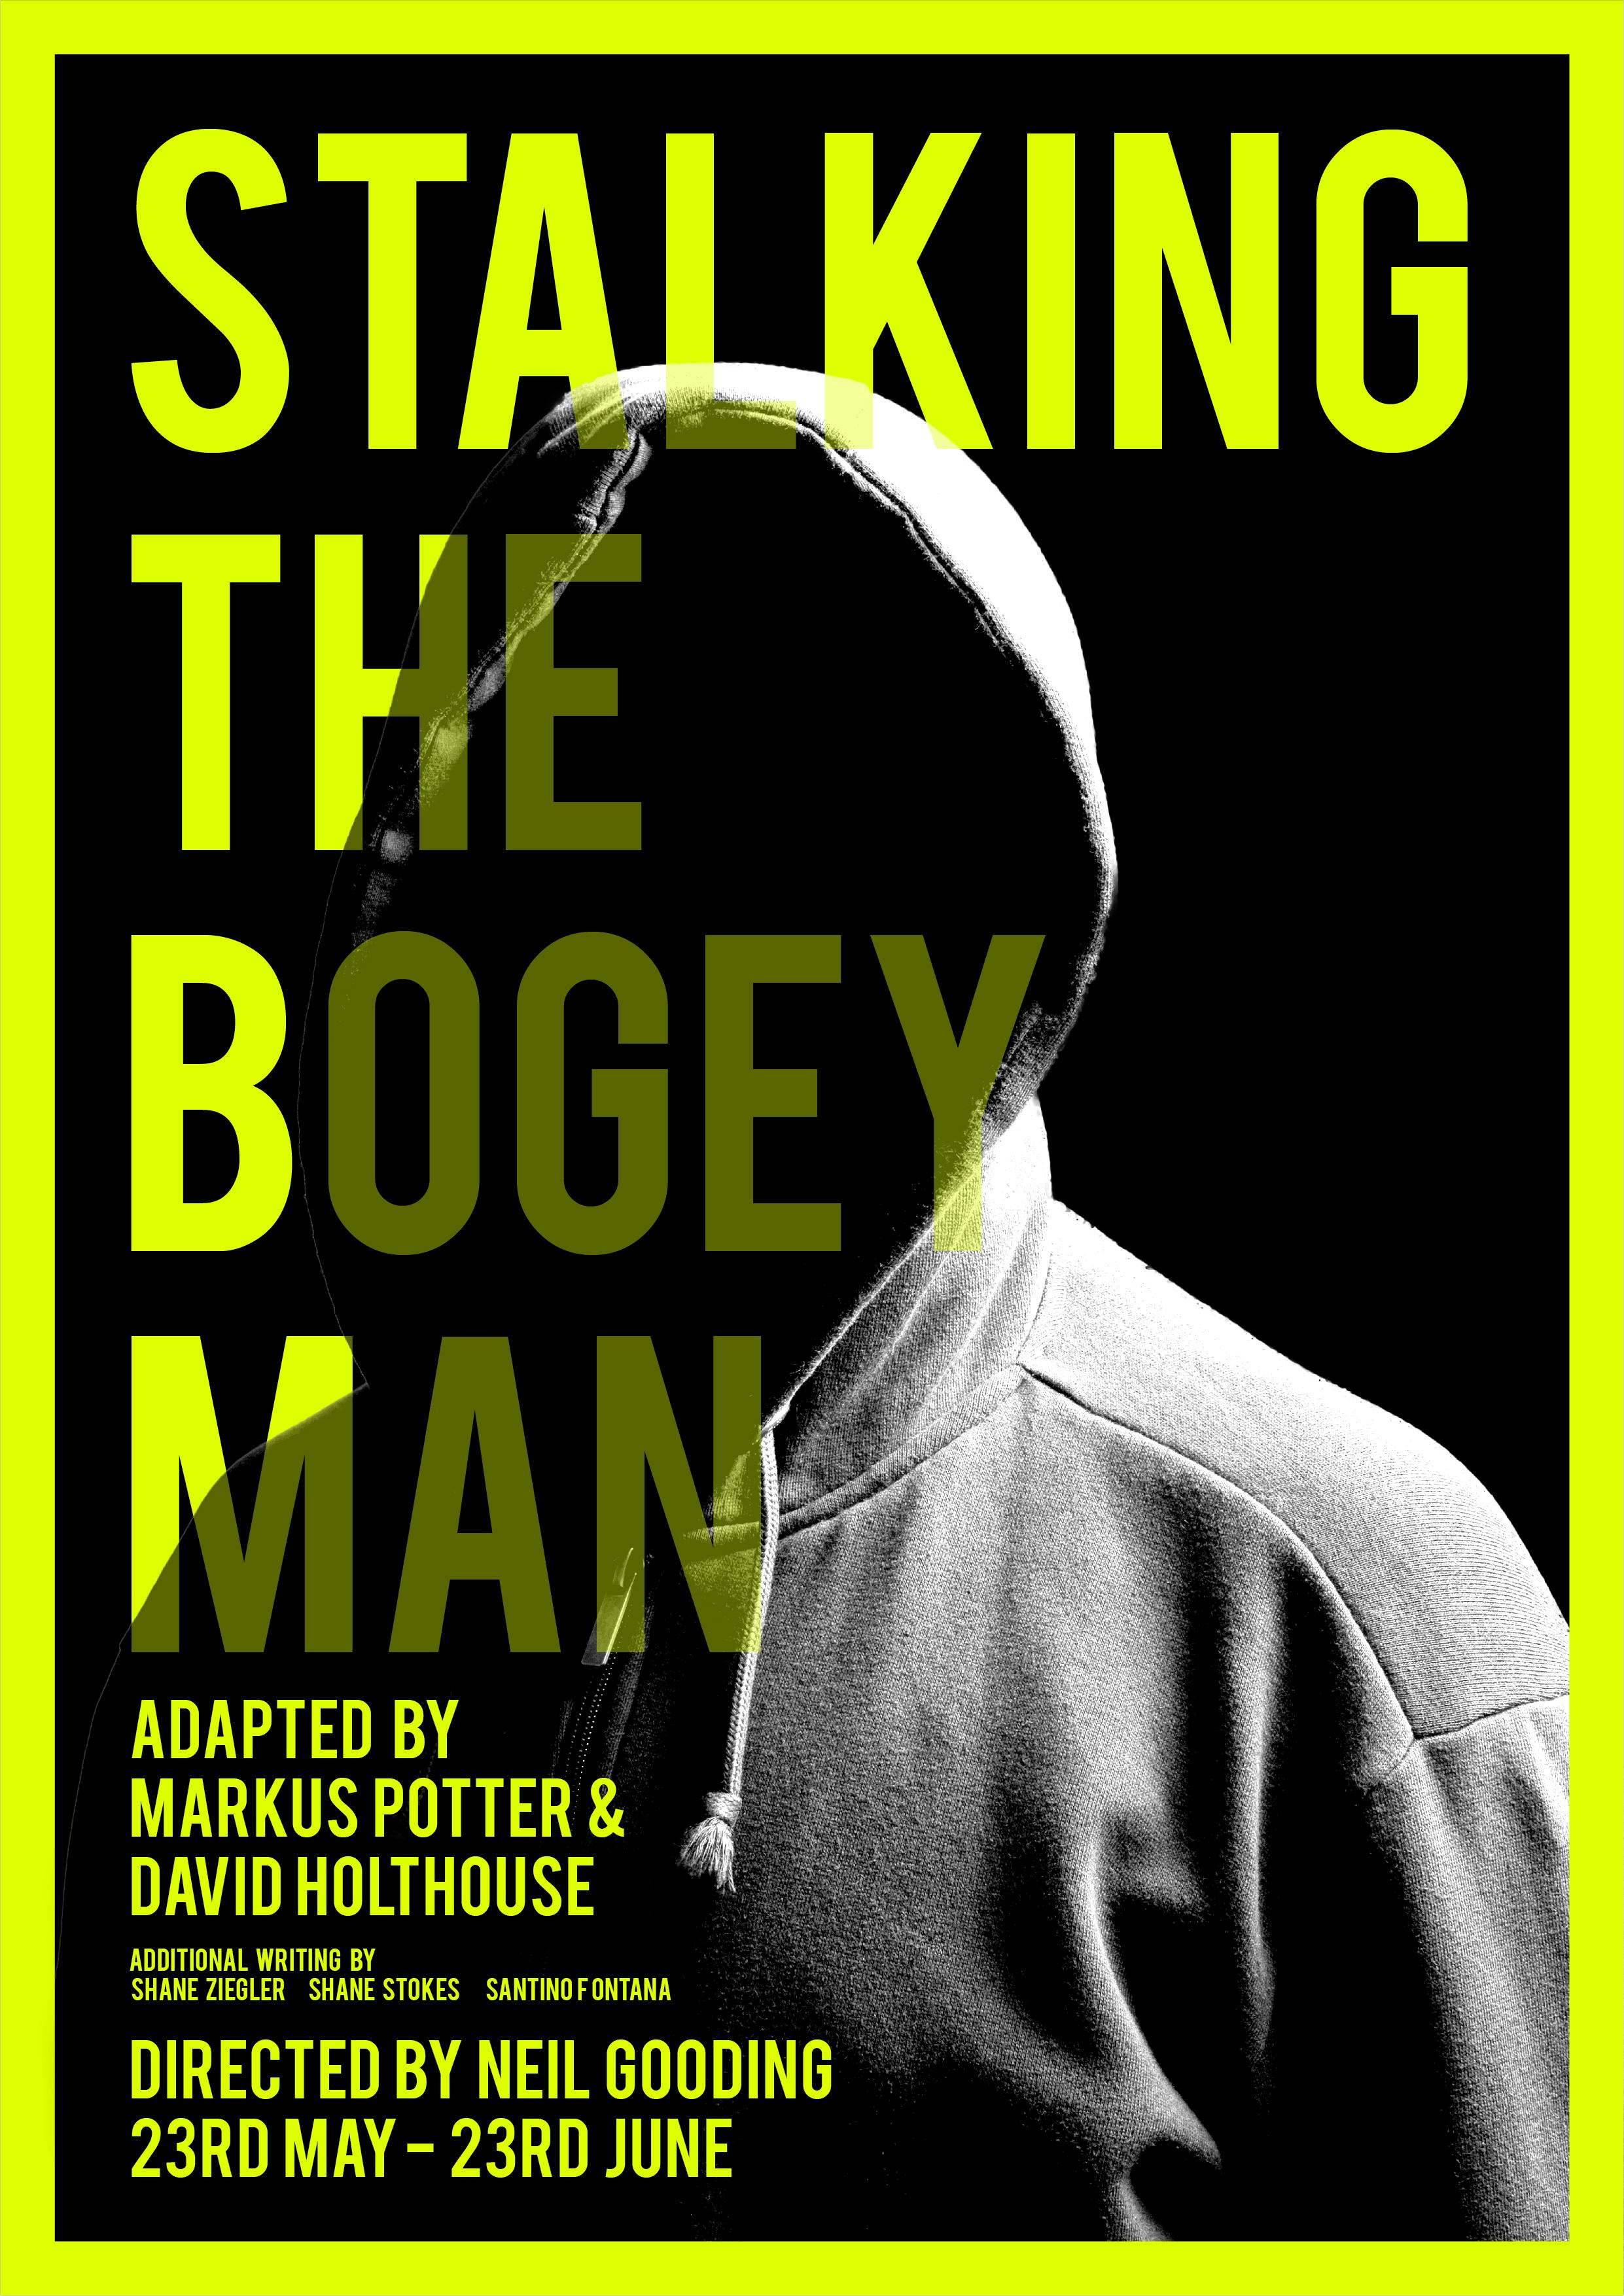 Copy of RLP19763_Stalking the Bogeyman_Web_A4